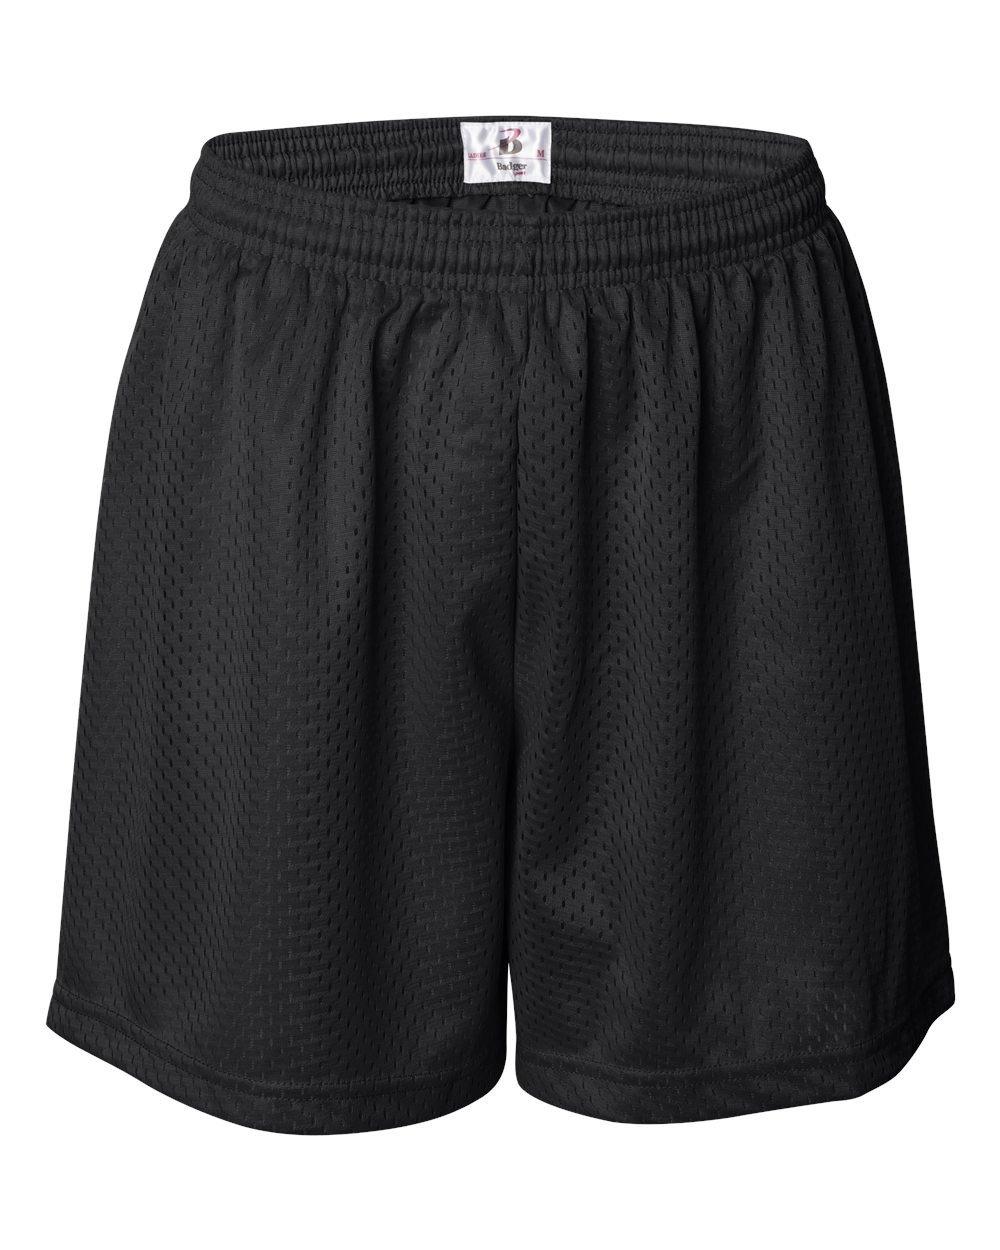 Badger Ladies' Mesh/Tricot 5'' Shorts, Blk, XX-Large